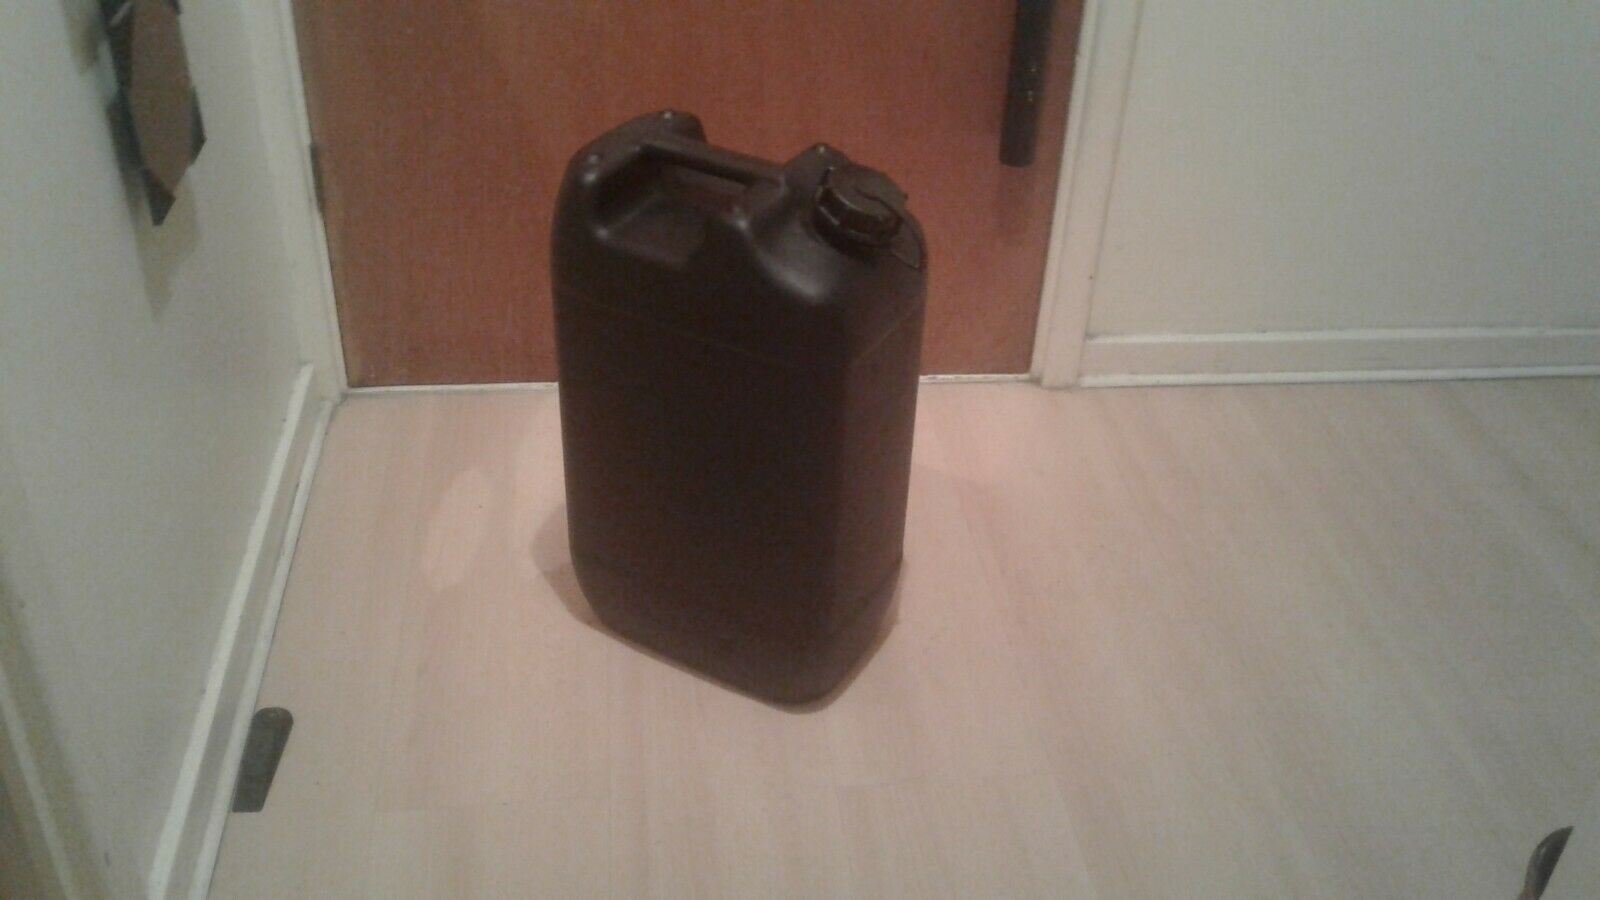 *20 LITRE*- CAPACITY BLACK PLASTIC LIQUIDS CONTAINER WITH HANDLE& WIDE SCREW T